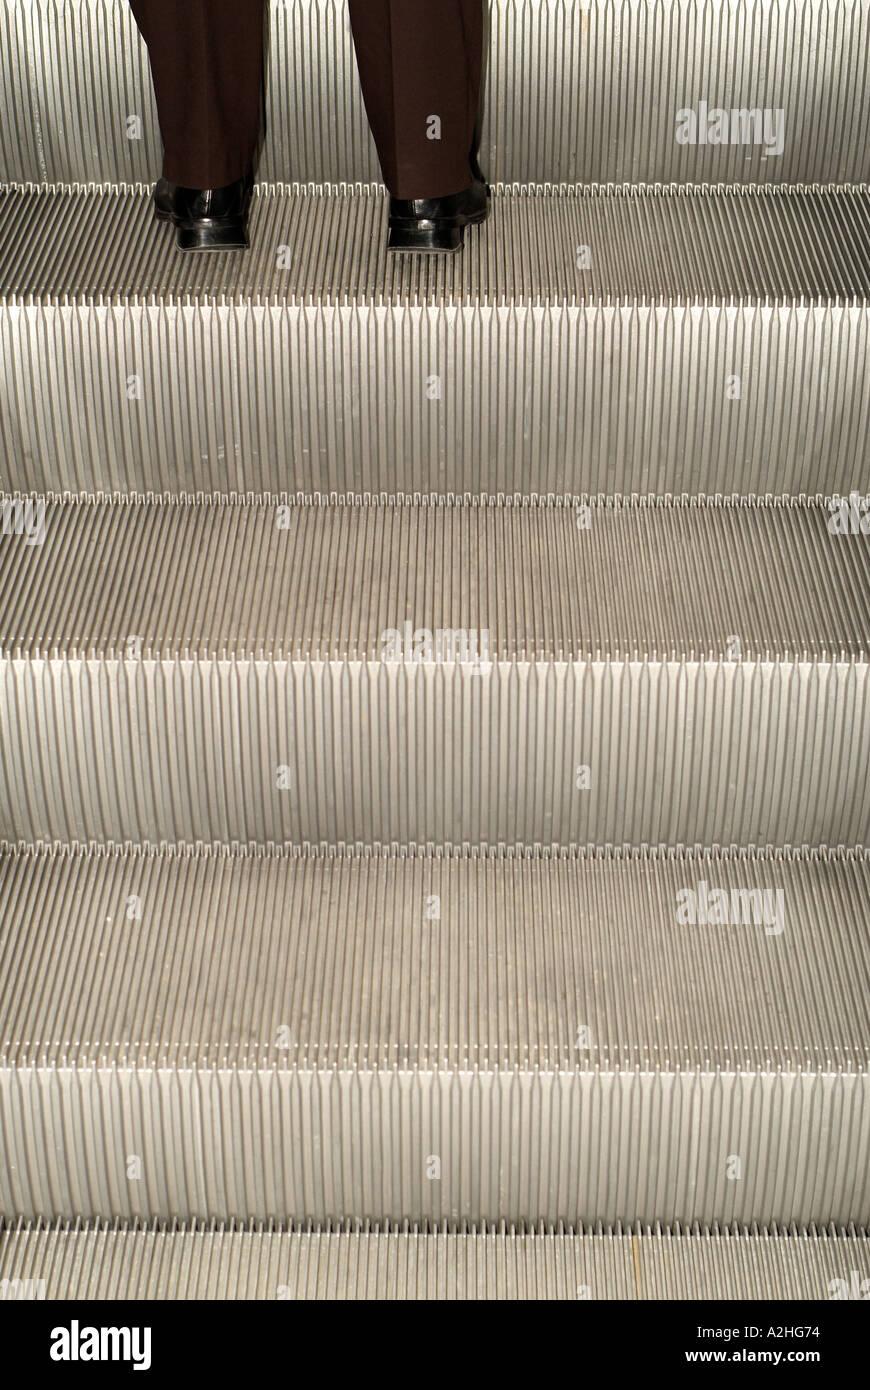 Businessman Going up an Escalator - Stock Image